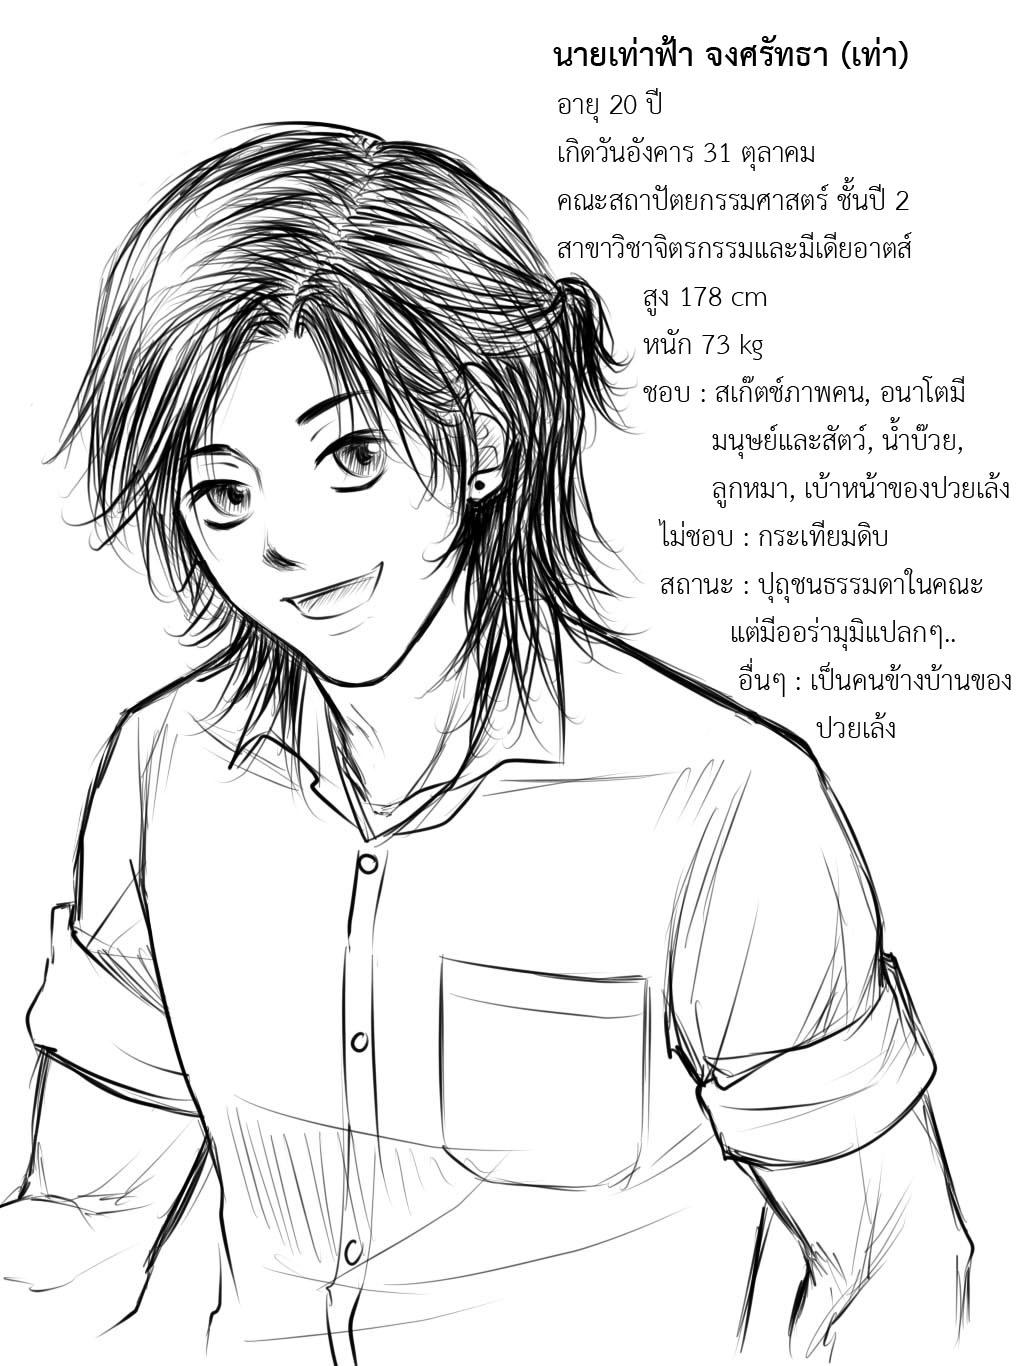 Profile - แนะนำตัวละคร